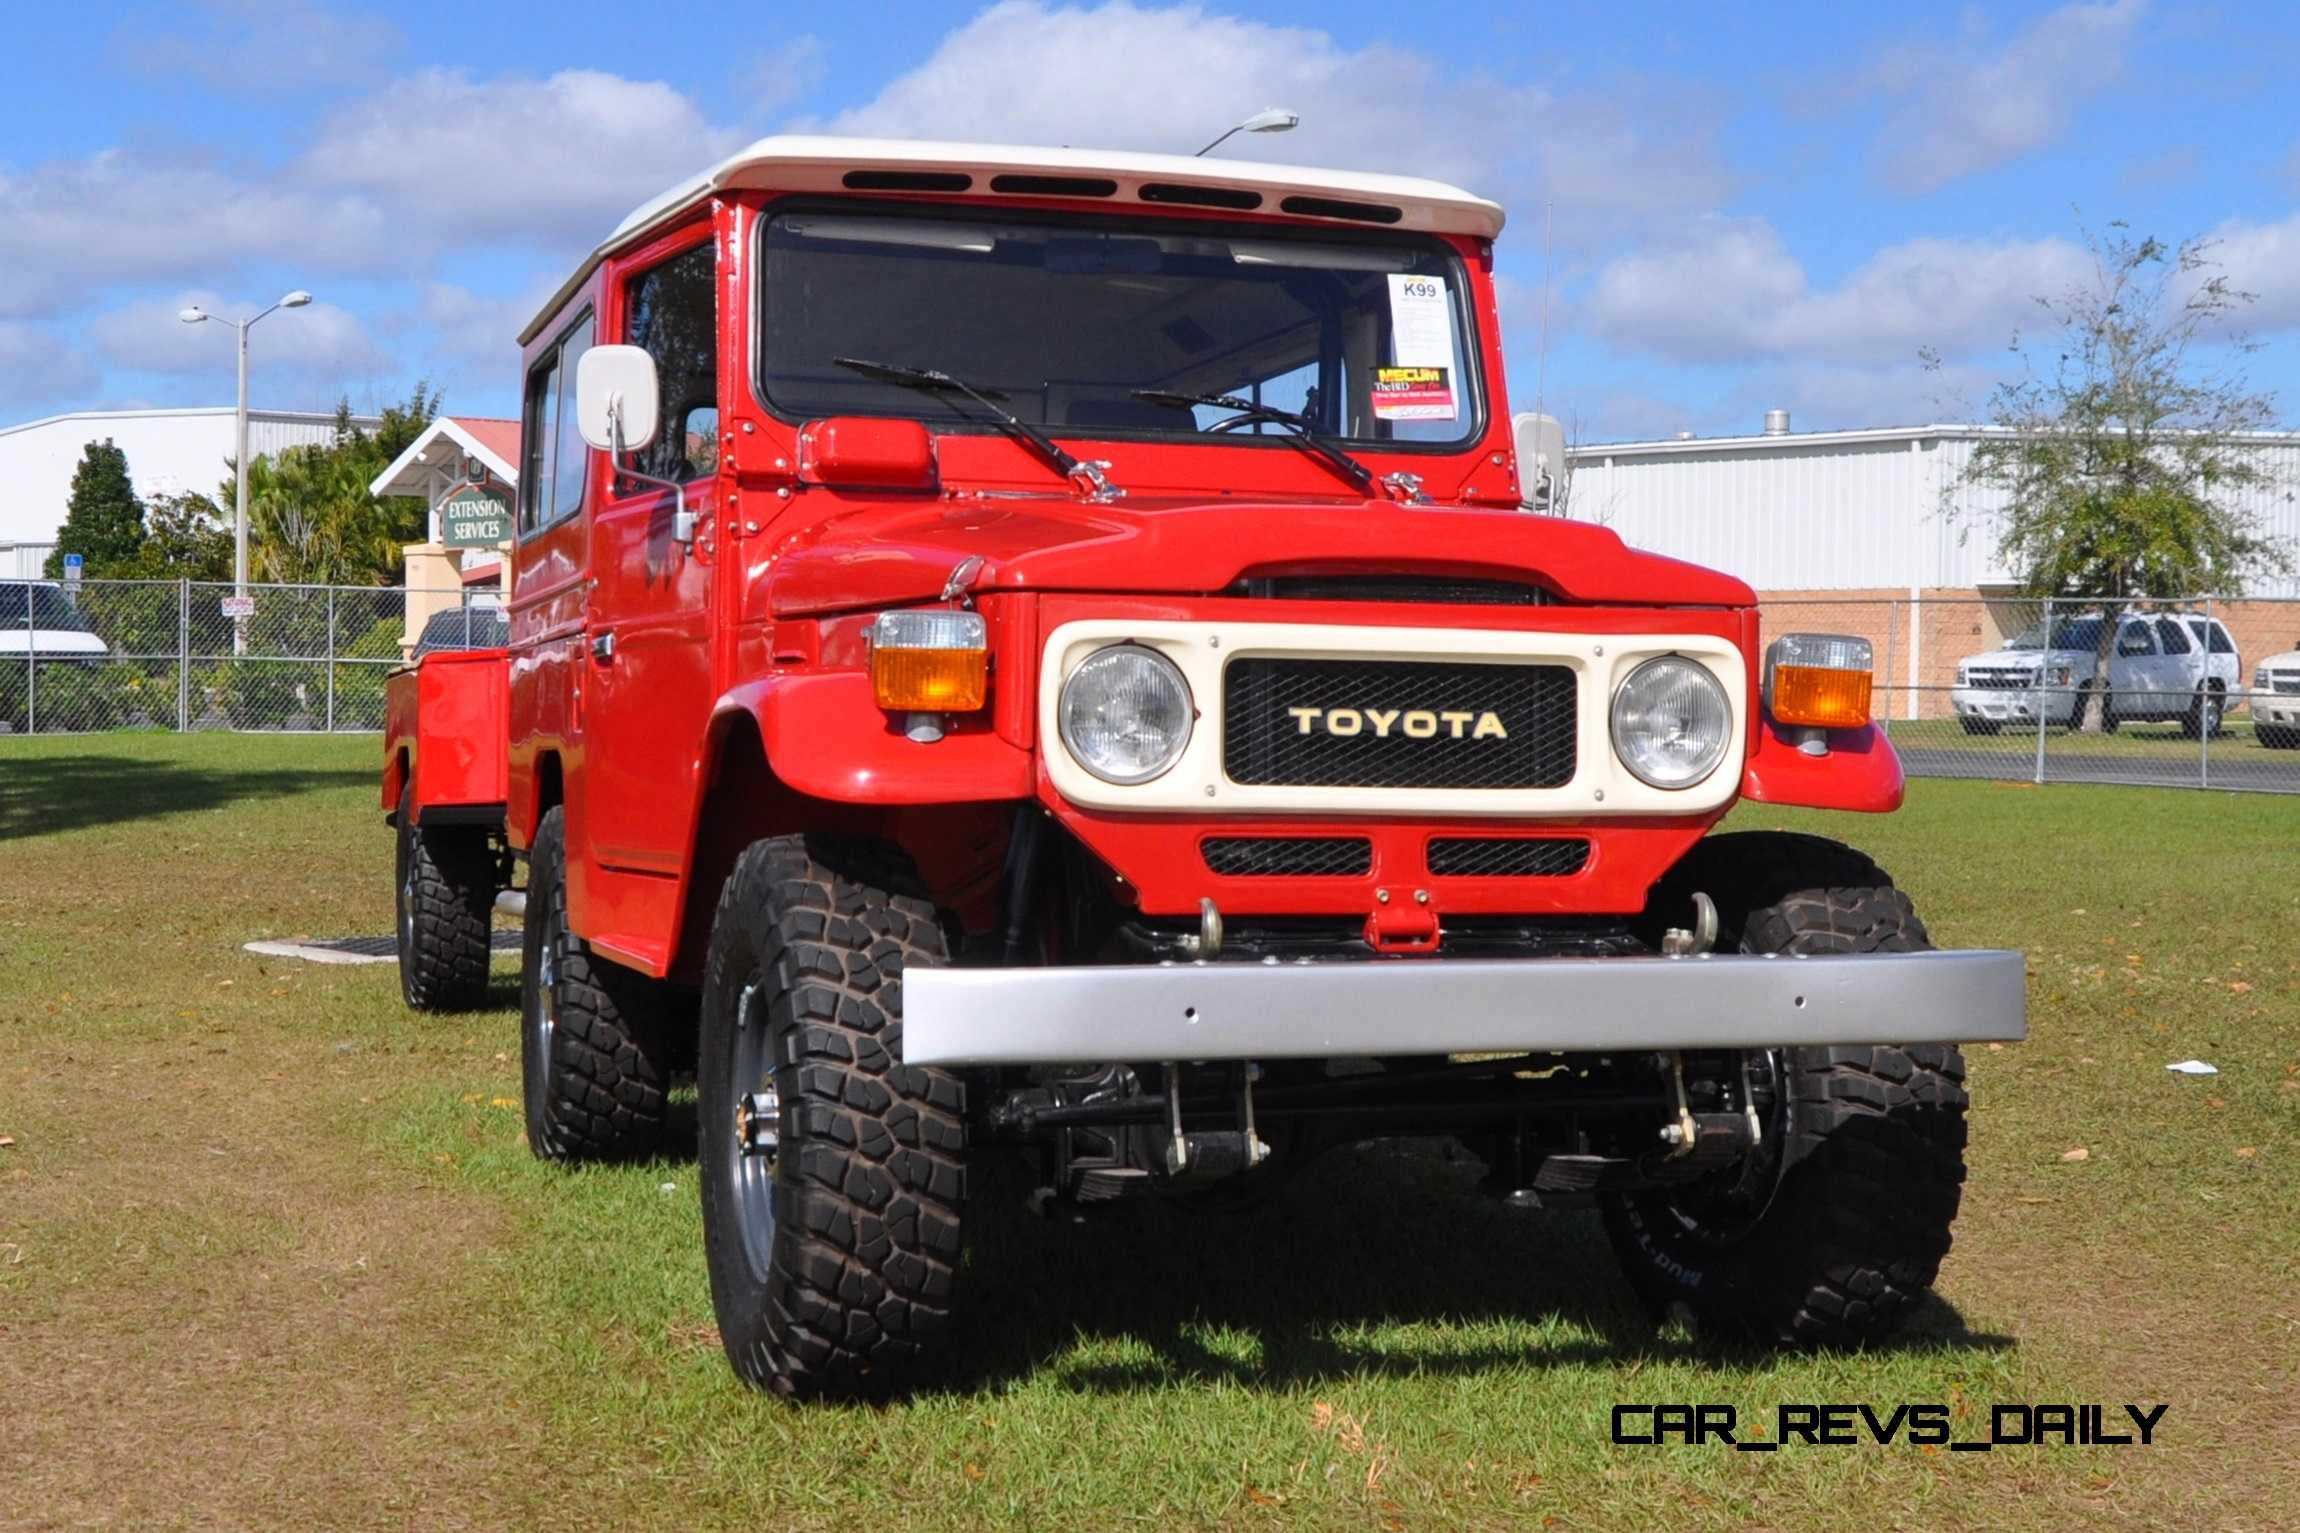 Mecum Florida 2015 Favorites – Toyota FJ40 Land Cruiser ...